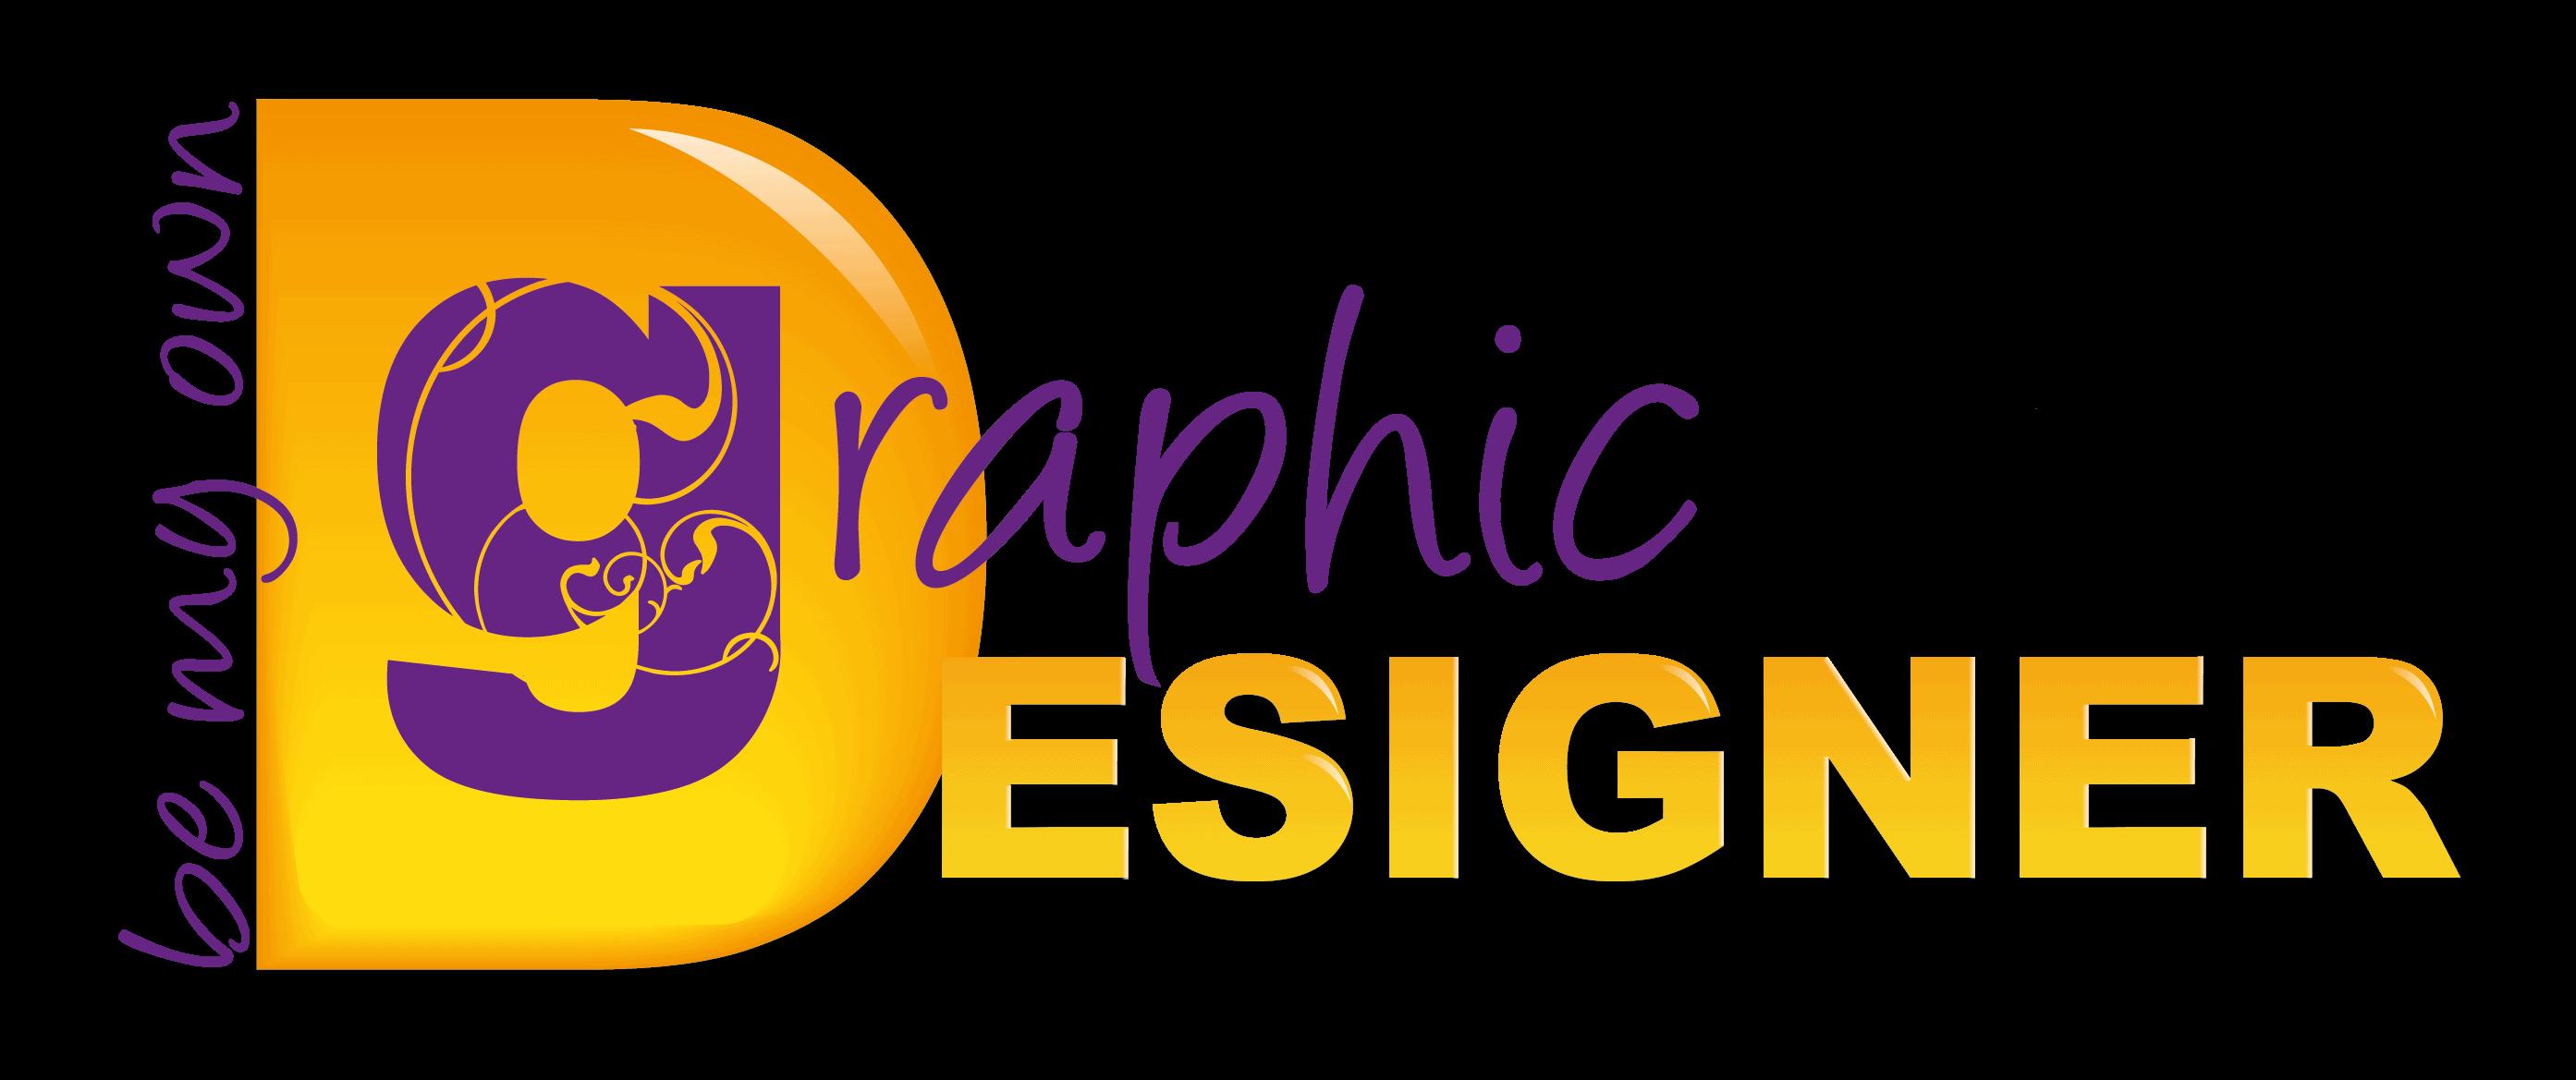 Dachboard Design  Websites Graphic amp Logo Design